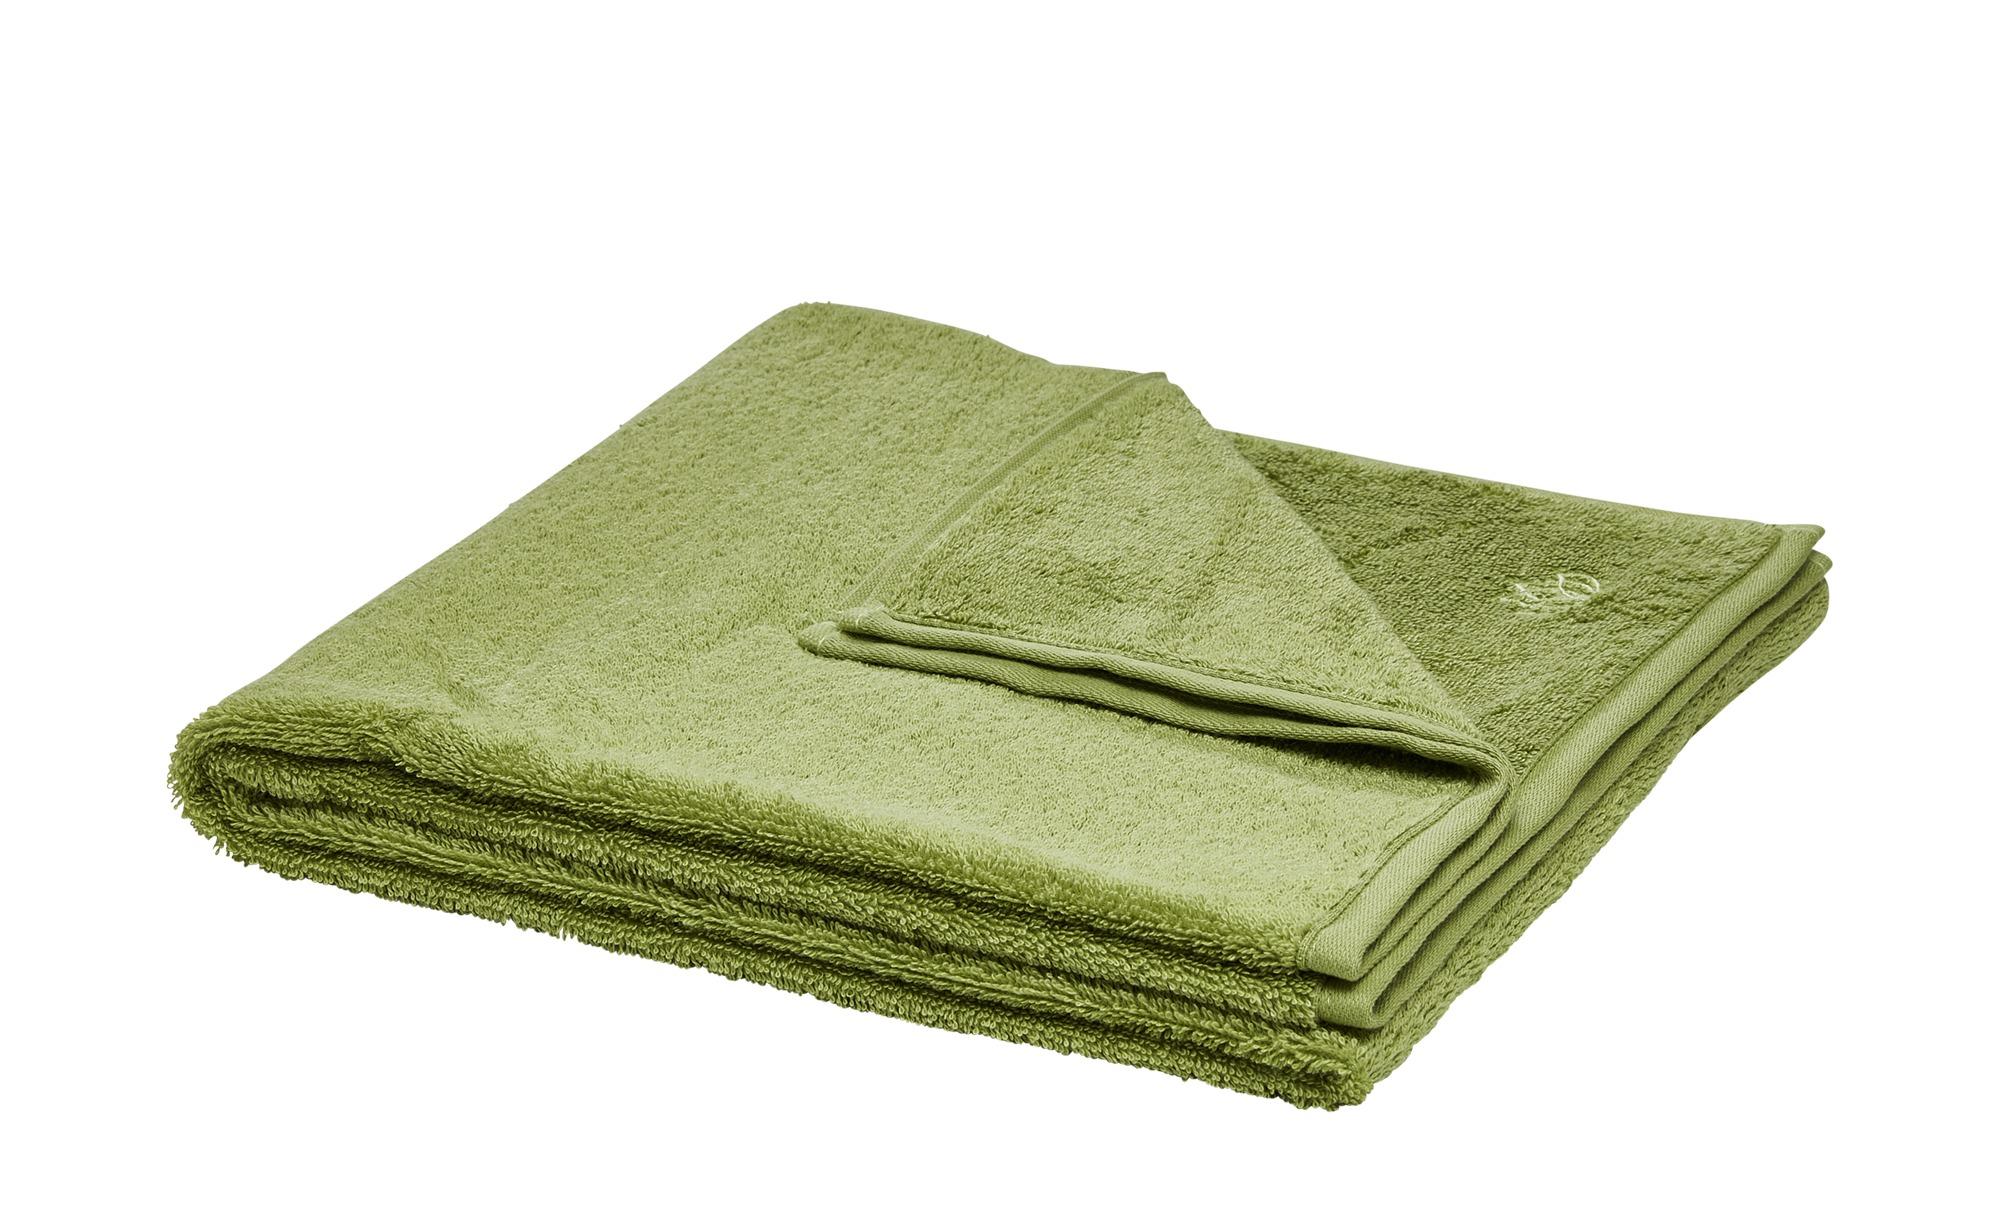 LAVIDA Duschtuch  Touch ¦ grün ¦ 100% Baumwolle ¦ Maße (cm): B: 67 Badtextilien und Zubehör > Handtücher & Badetücher > Duschtücher - Höffner